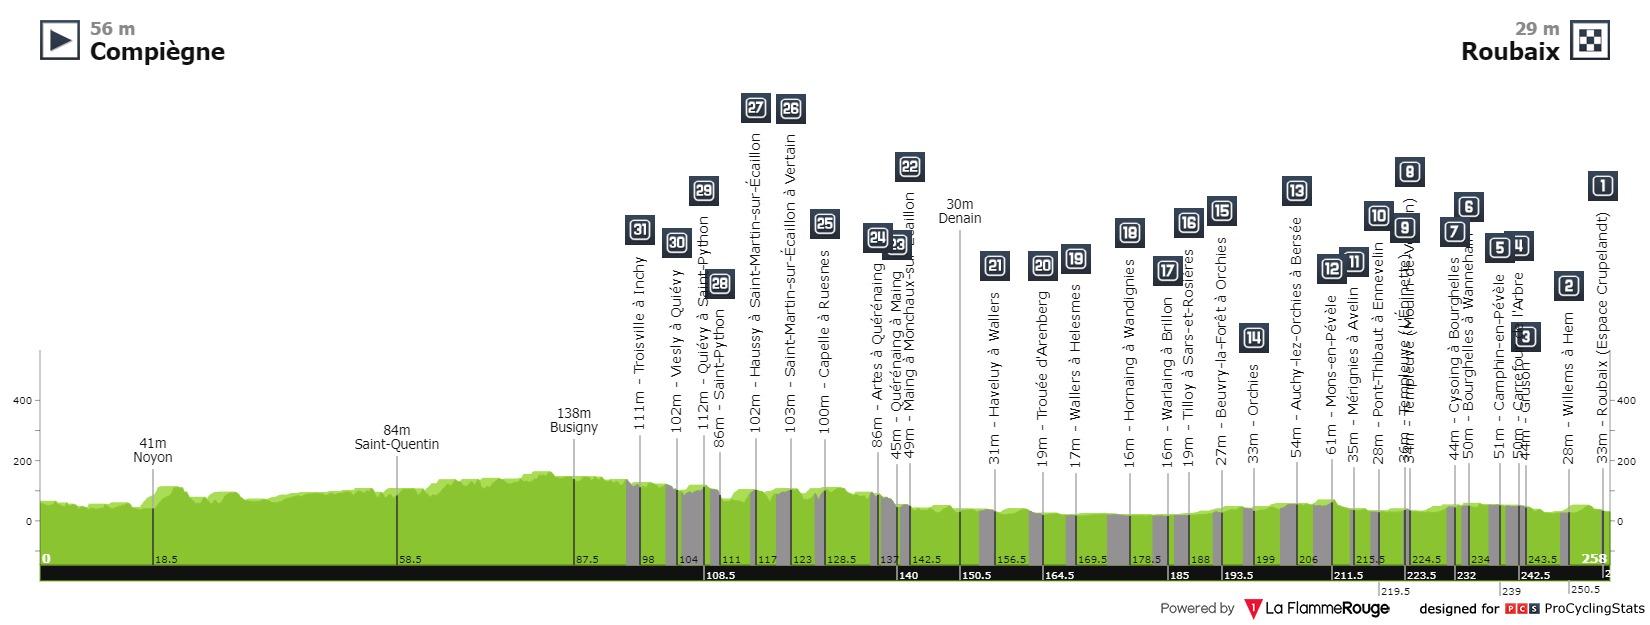 Sonny Colbrelli Paris Roubaix